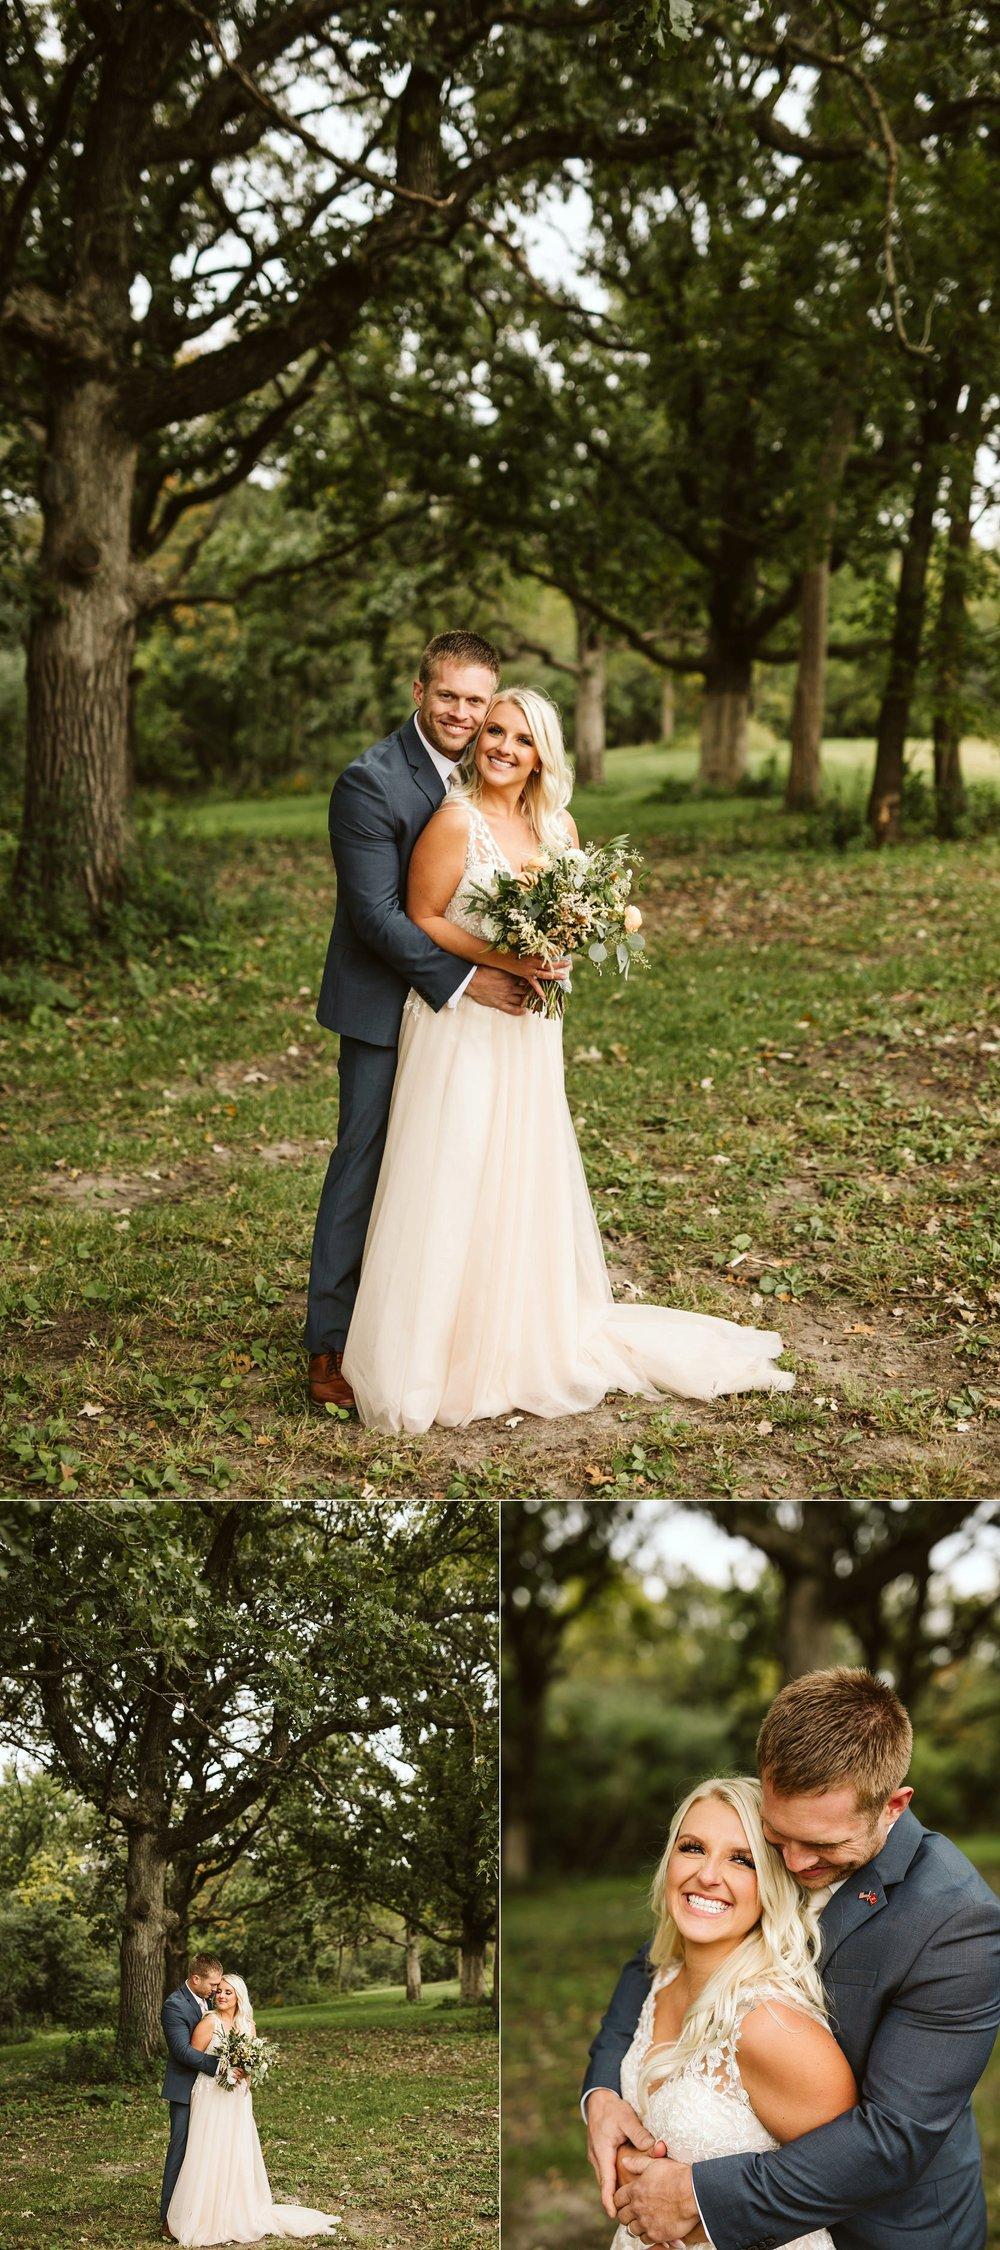 john-p-furber-farm-wedding-in-september-blush-and-floral-84.jpg